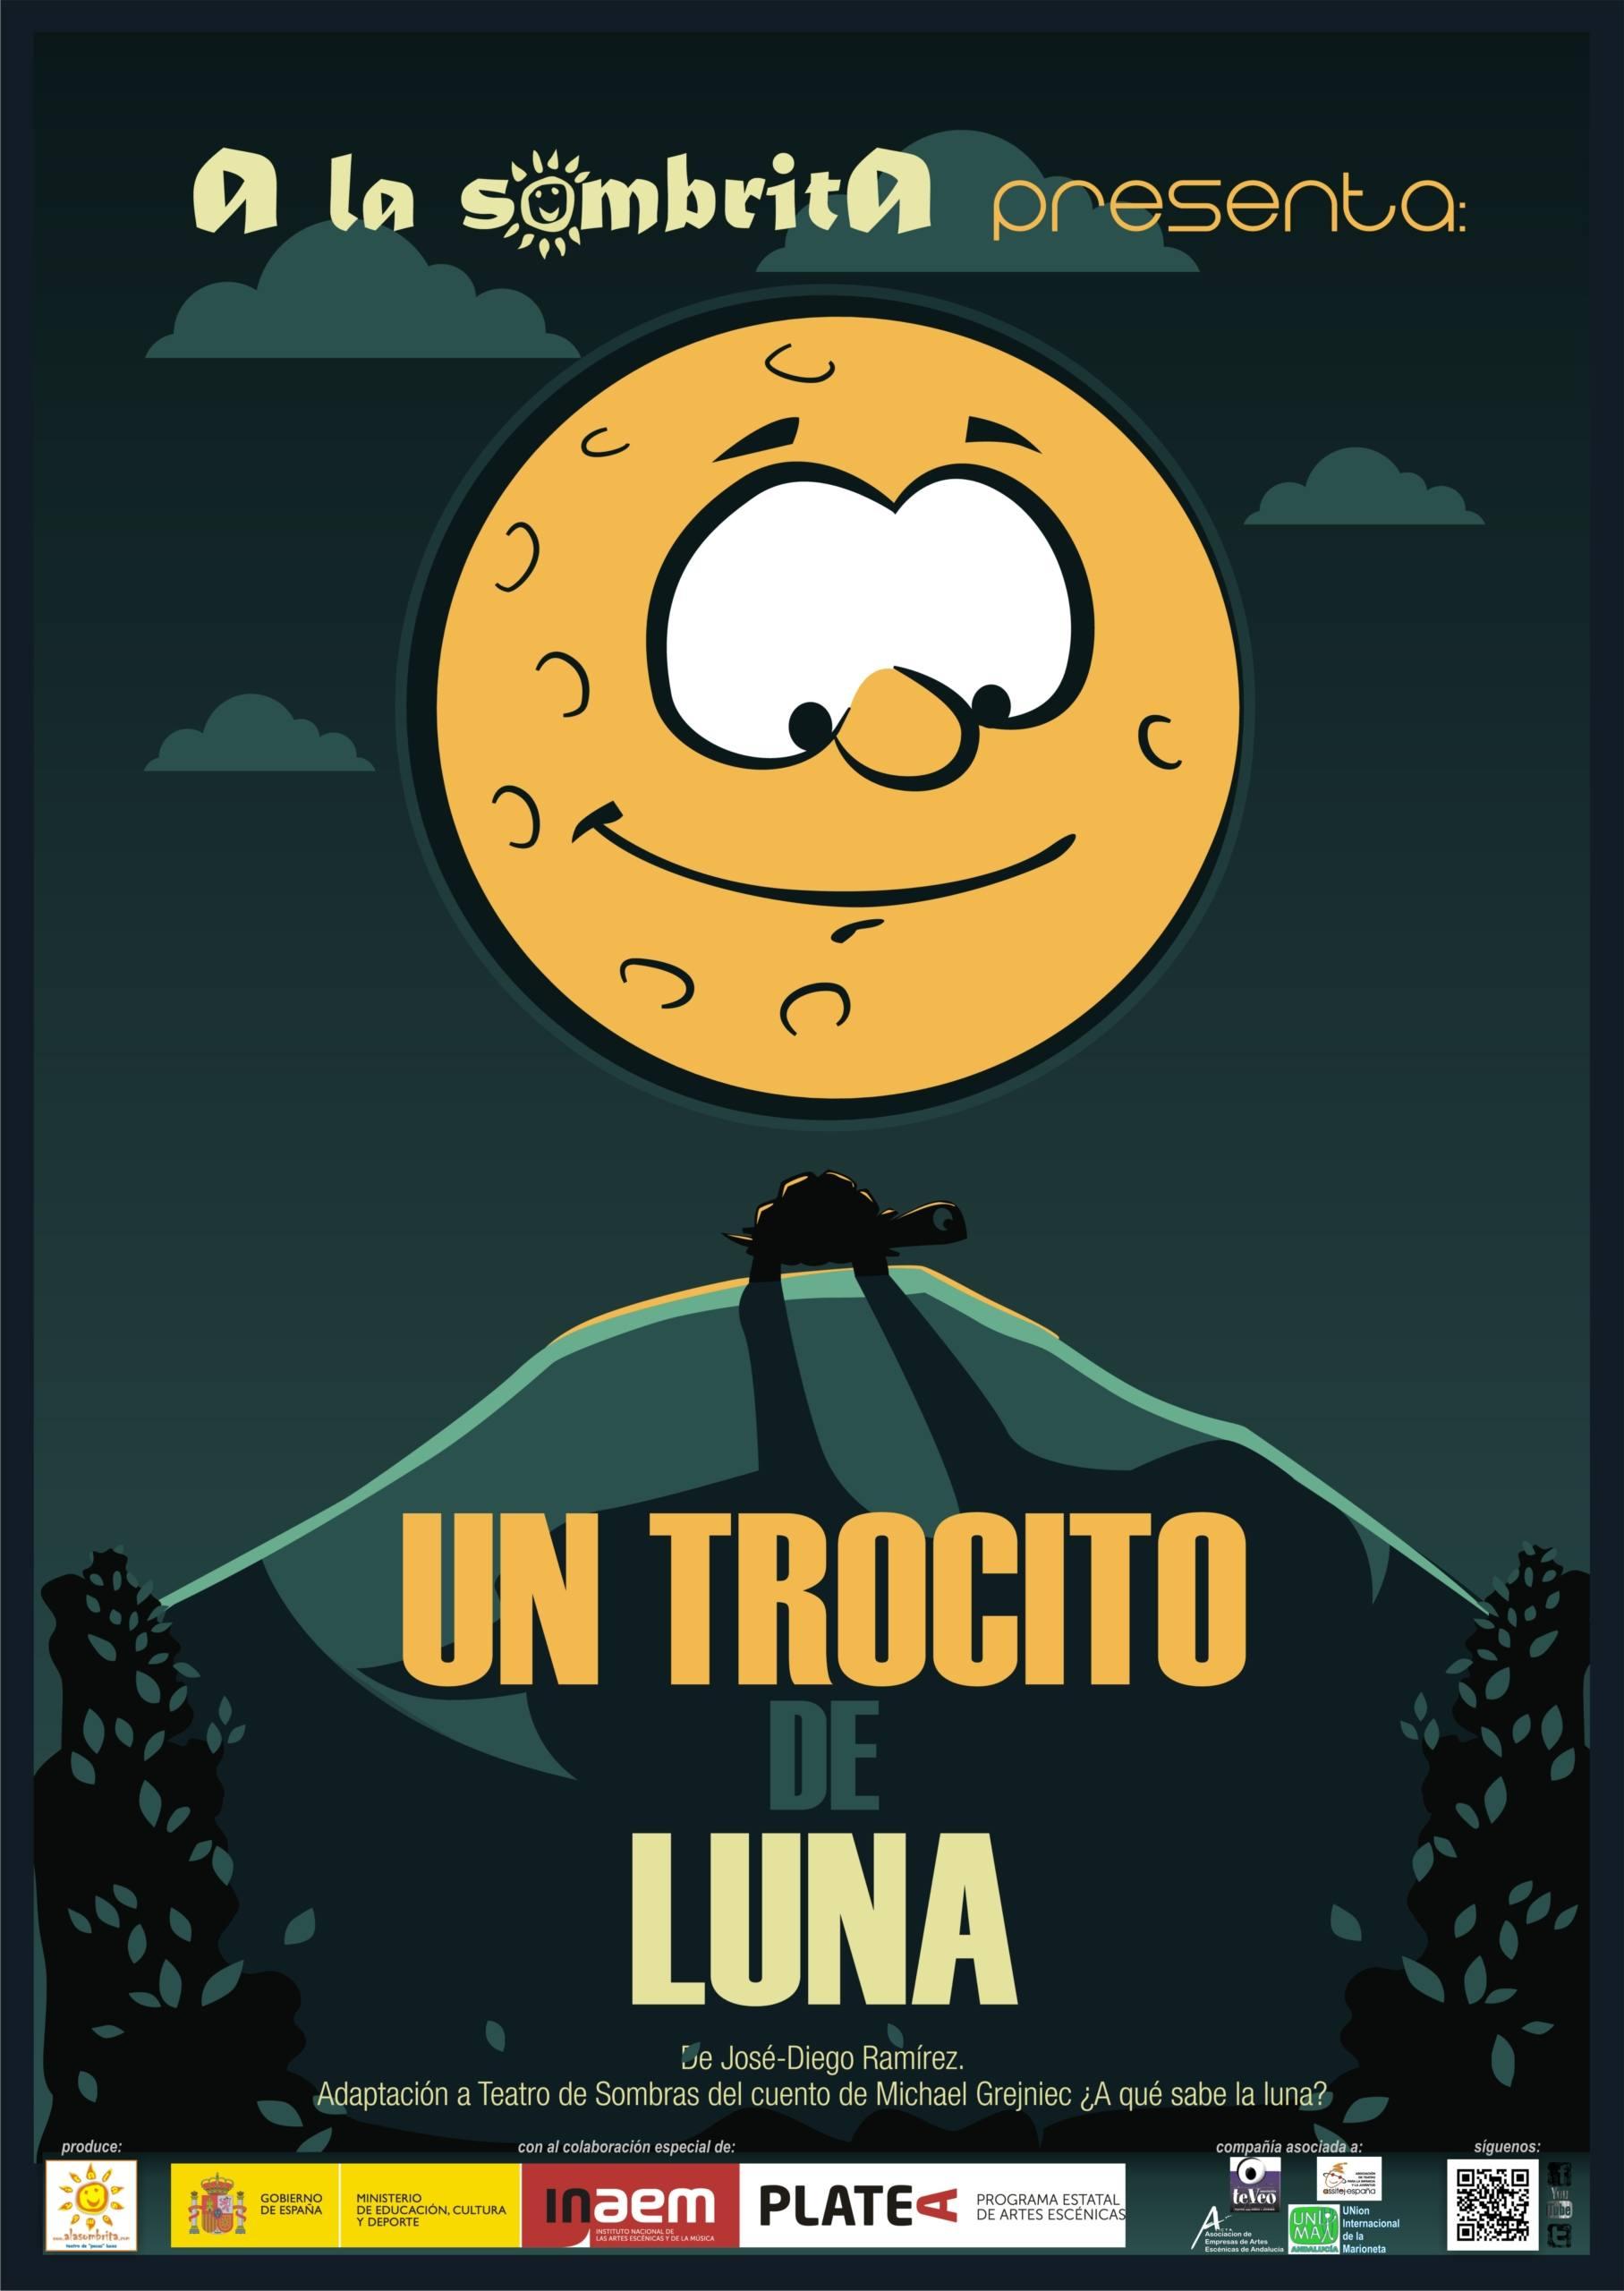 Un trocito de luna